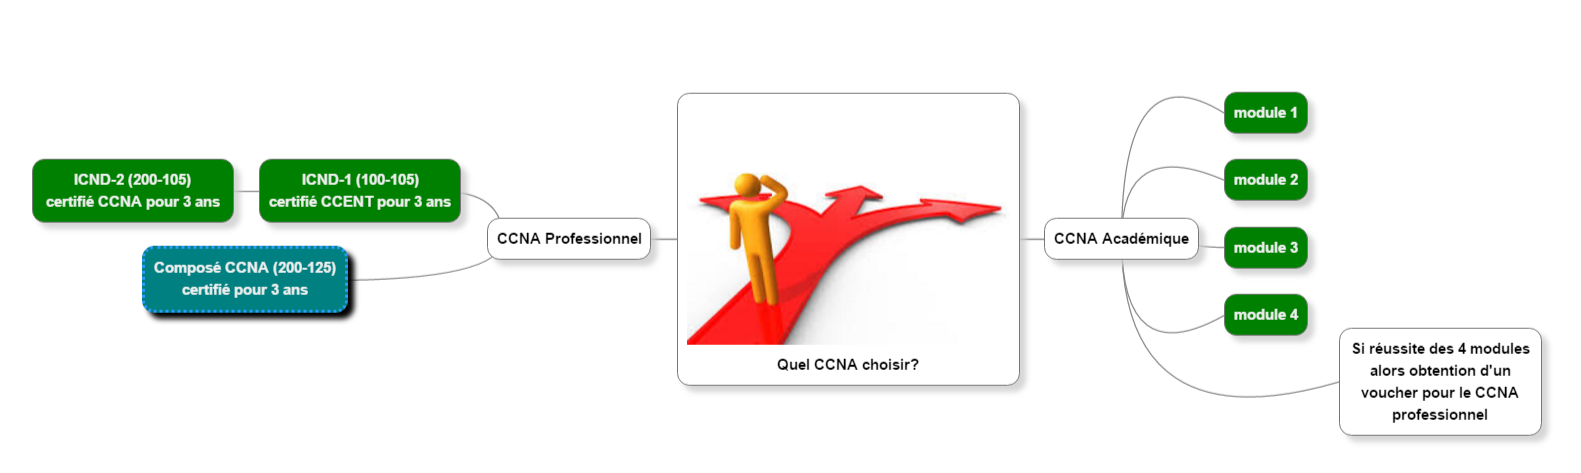 chemin_certification